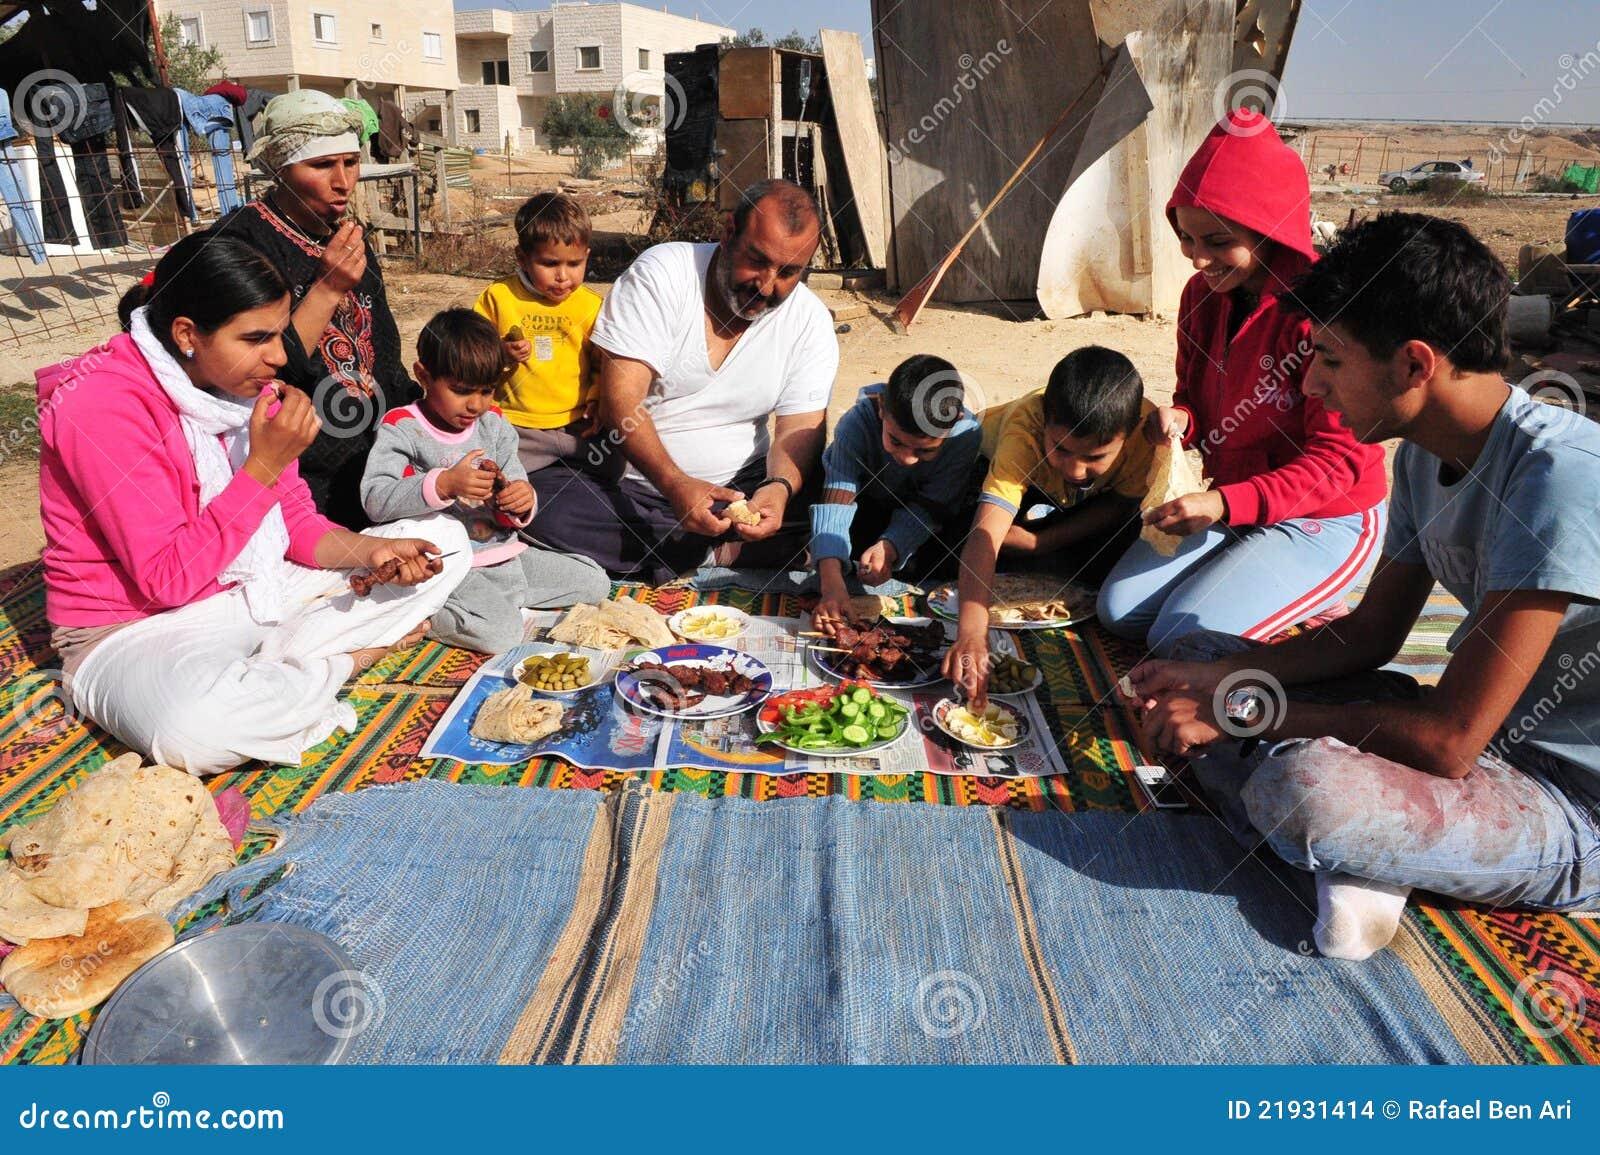 Islam - Eid al-Adha